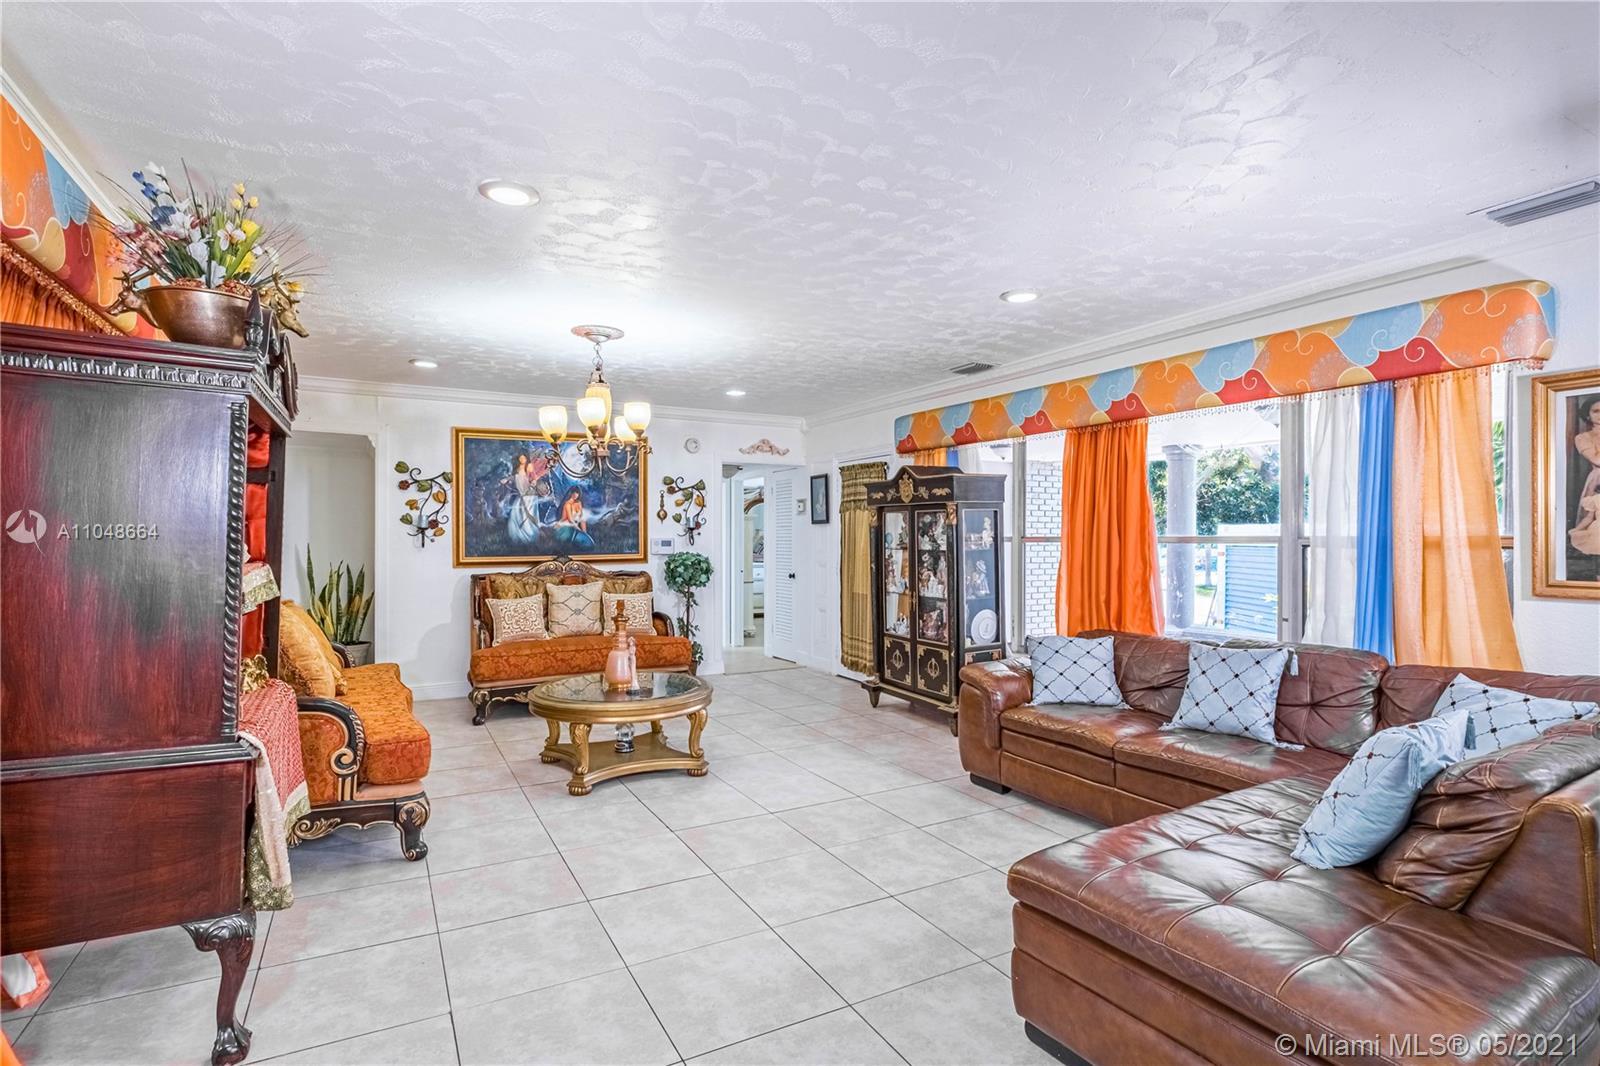 Shore Crest - 8261 N Bayshore Dr, Miami, FL 33138